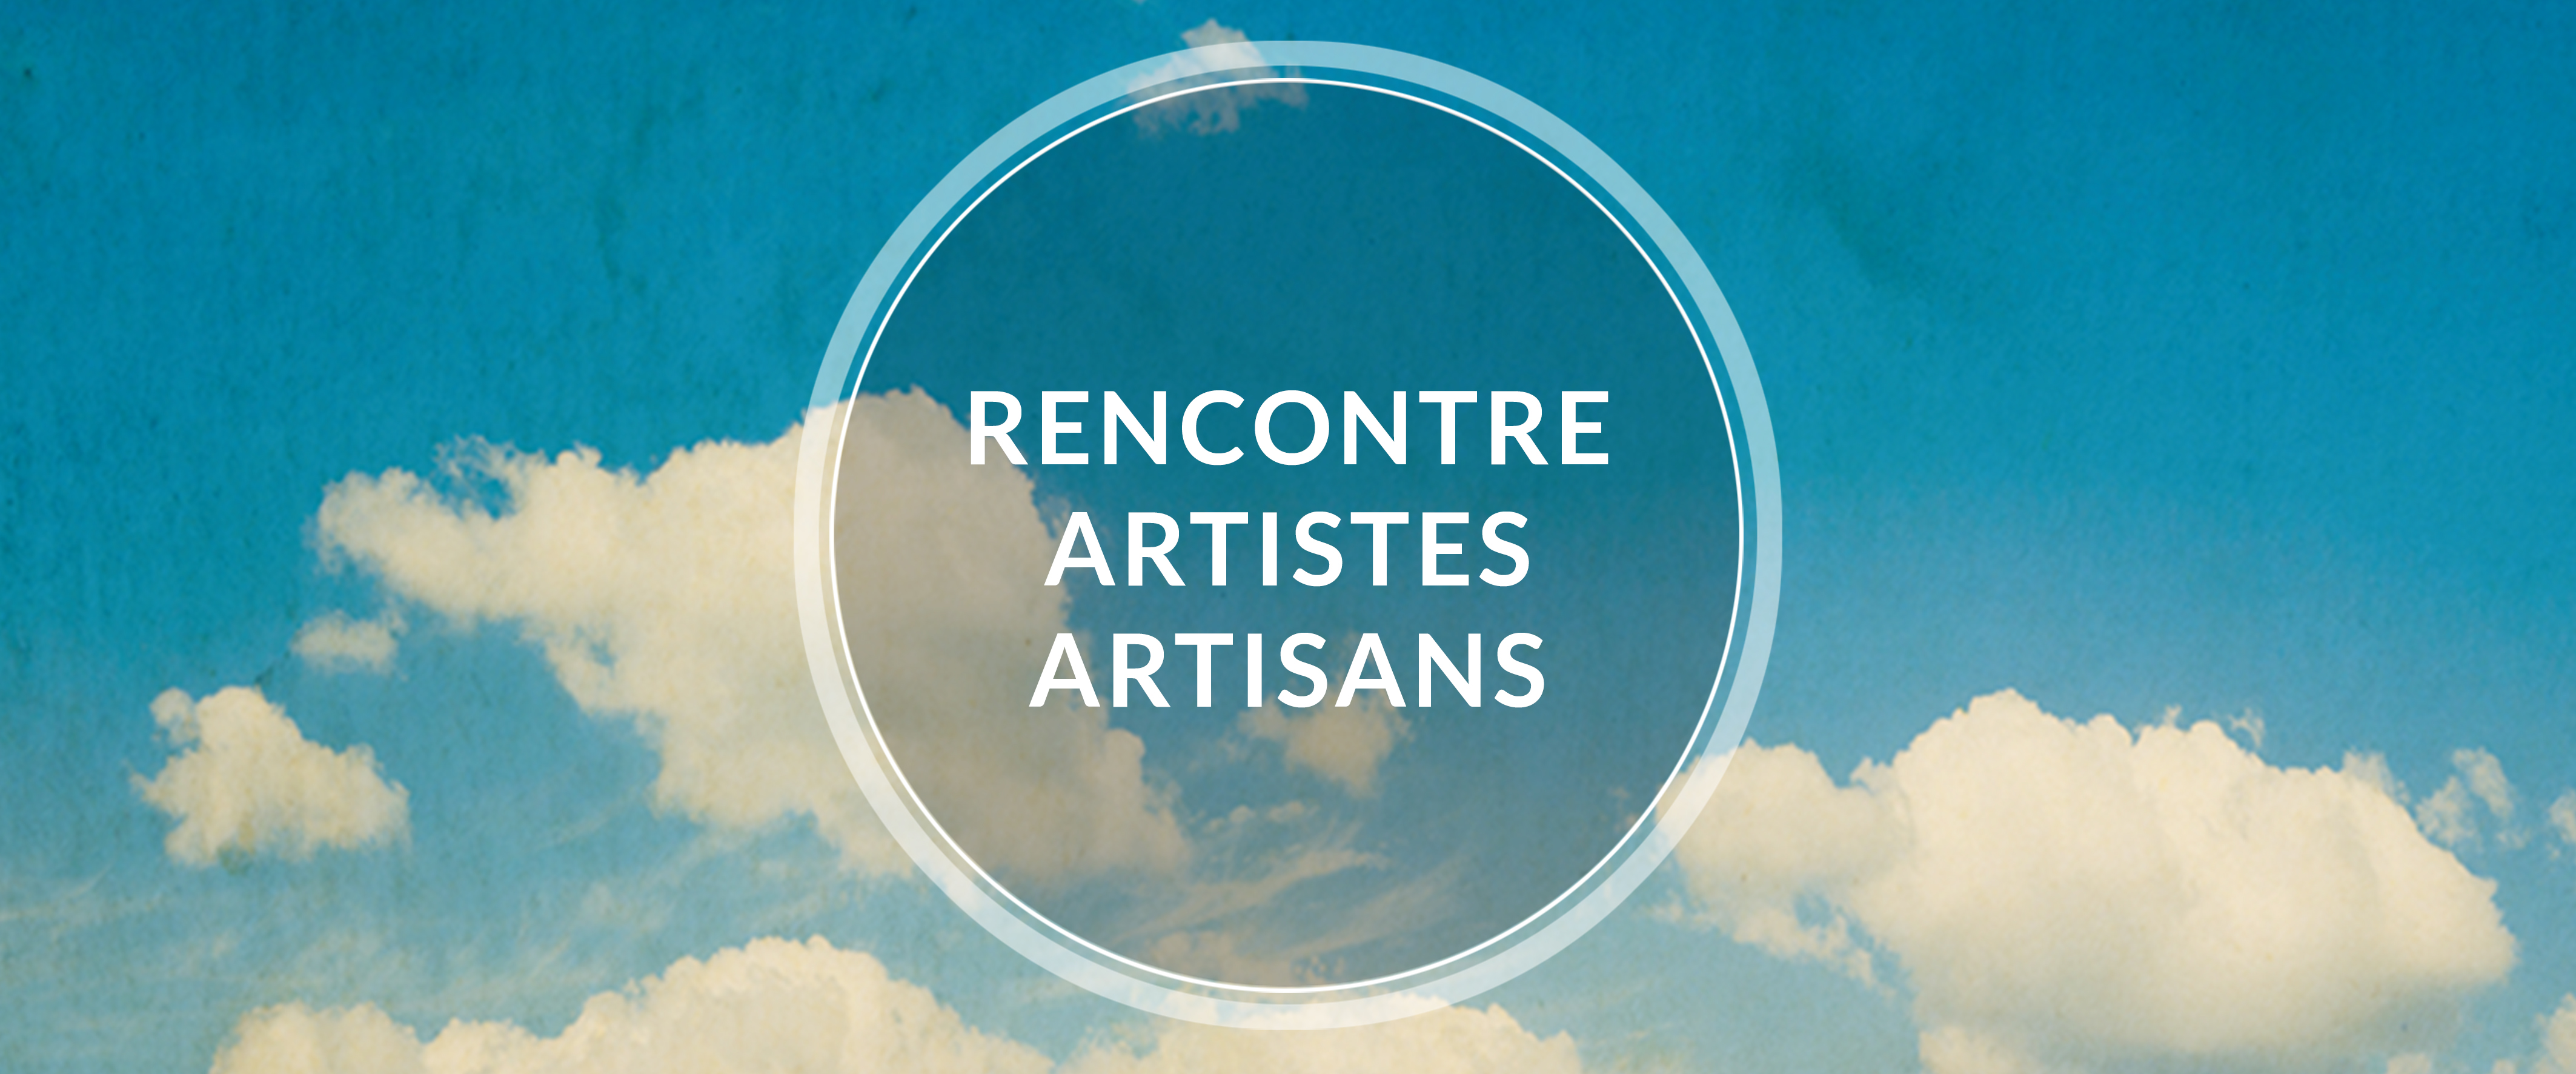 Site rencontre artistes